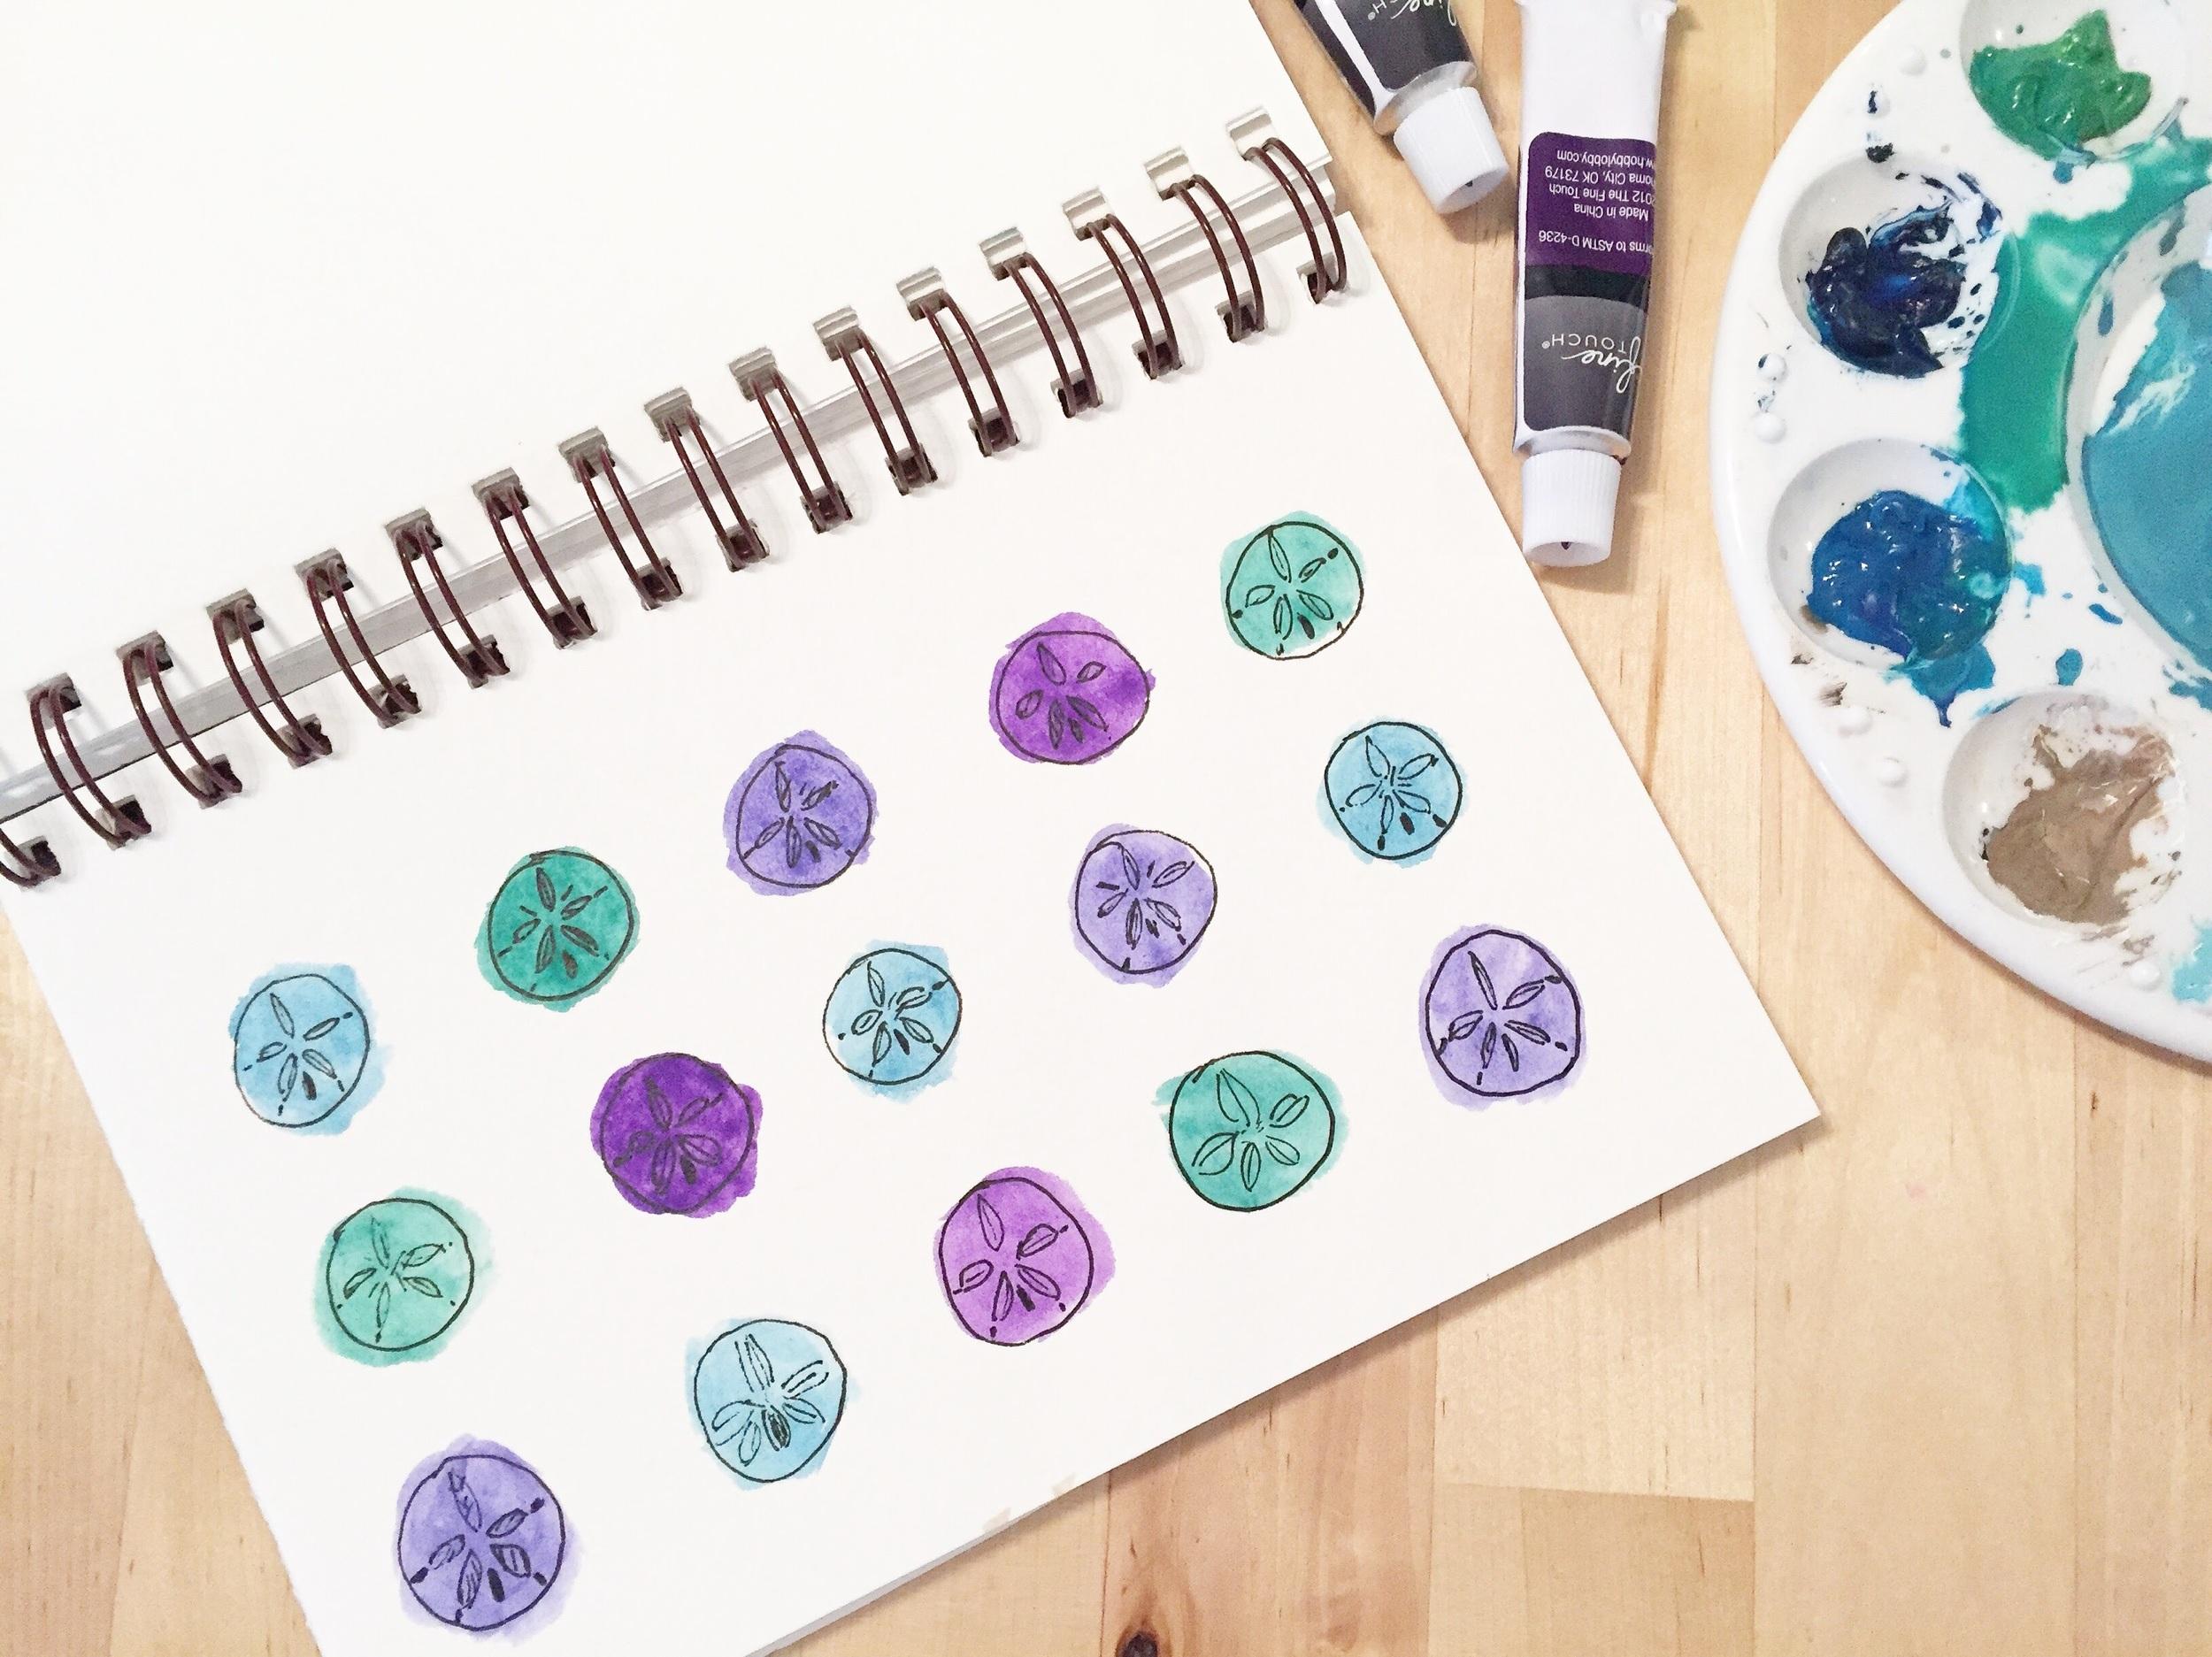 Sand-dollar-watercolor-pattern